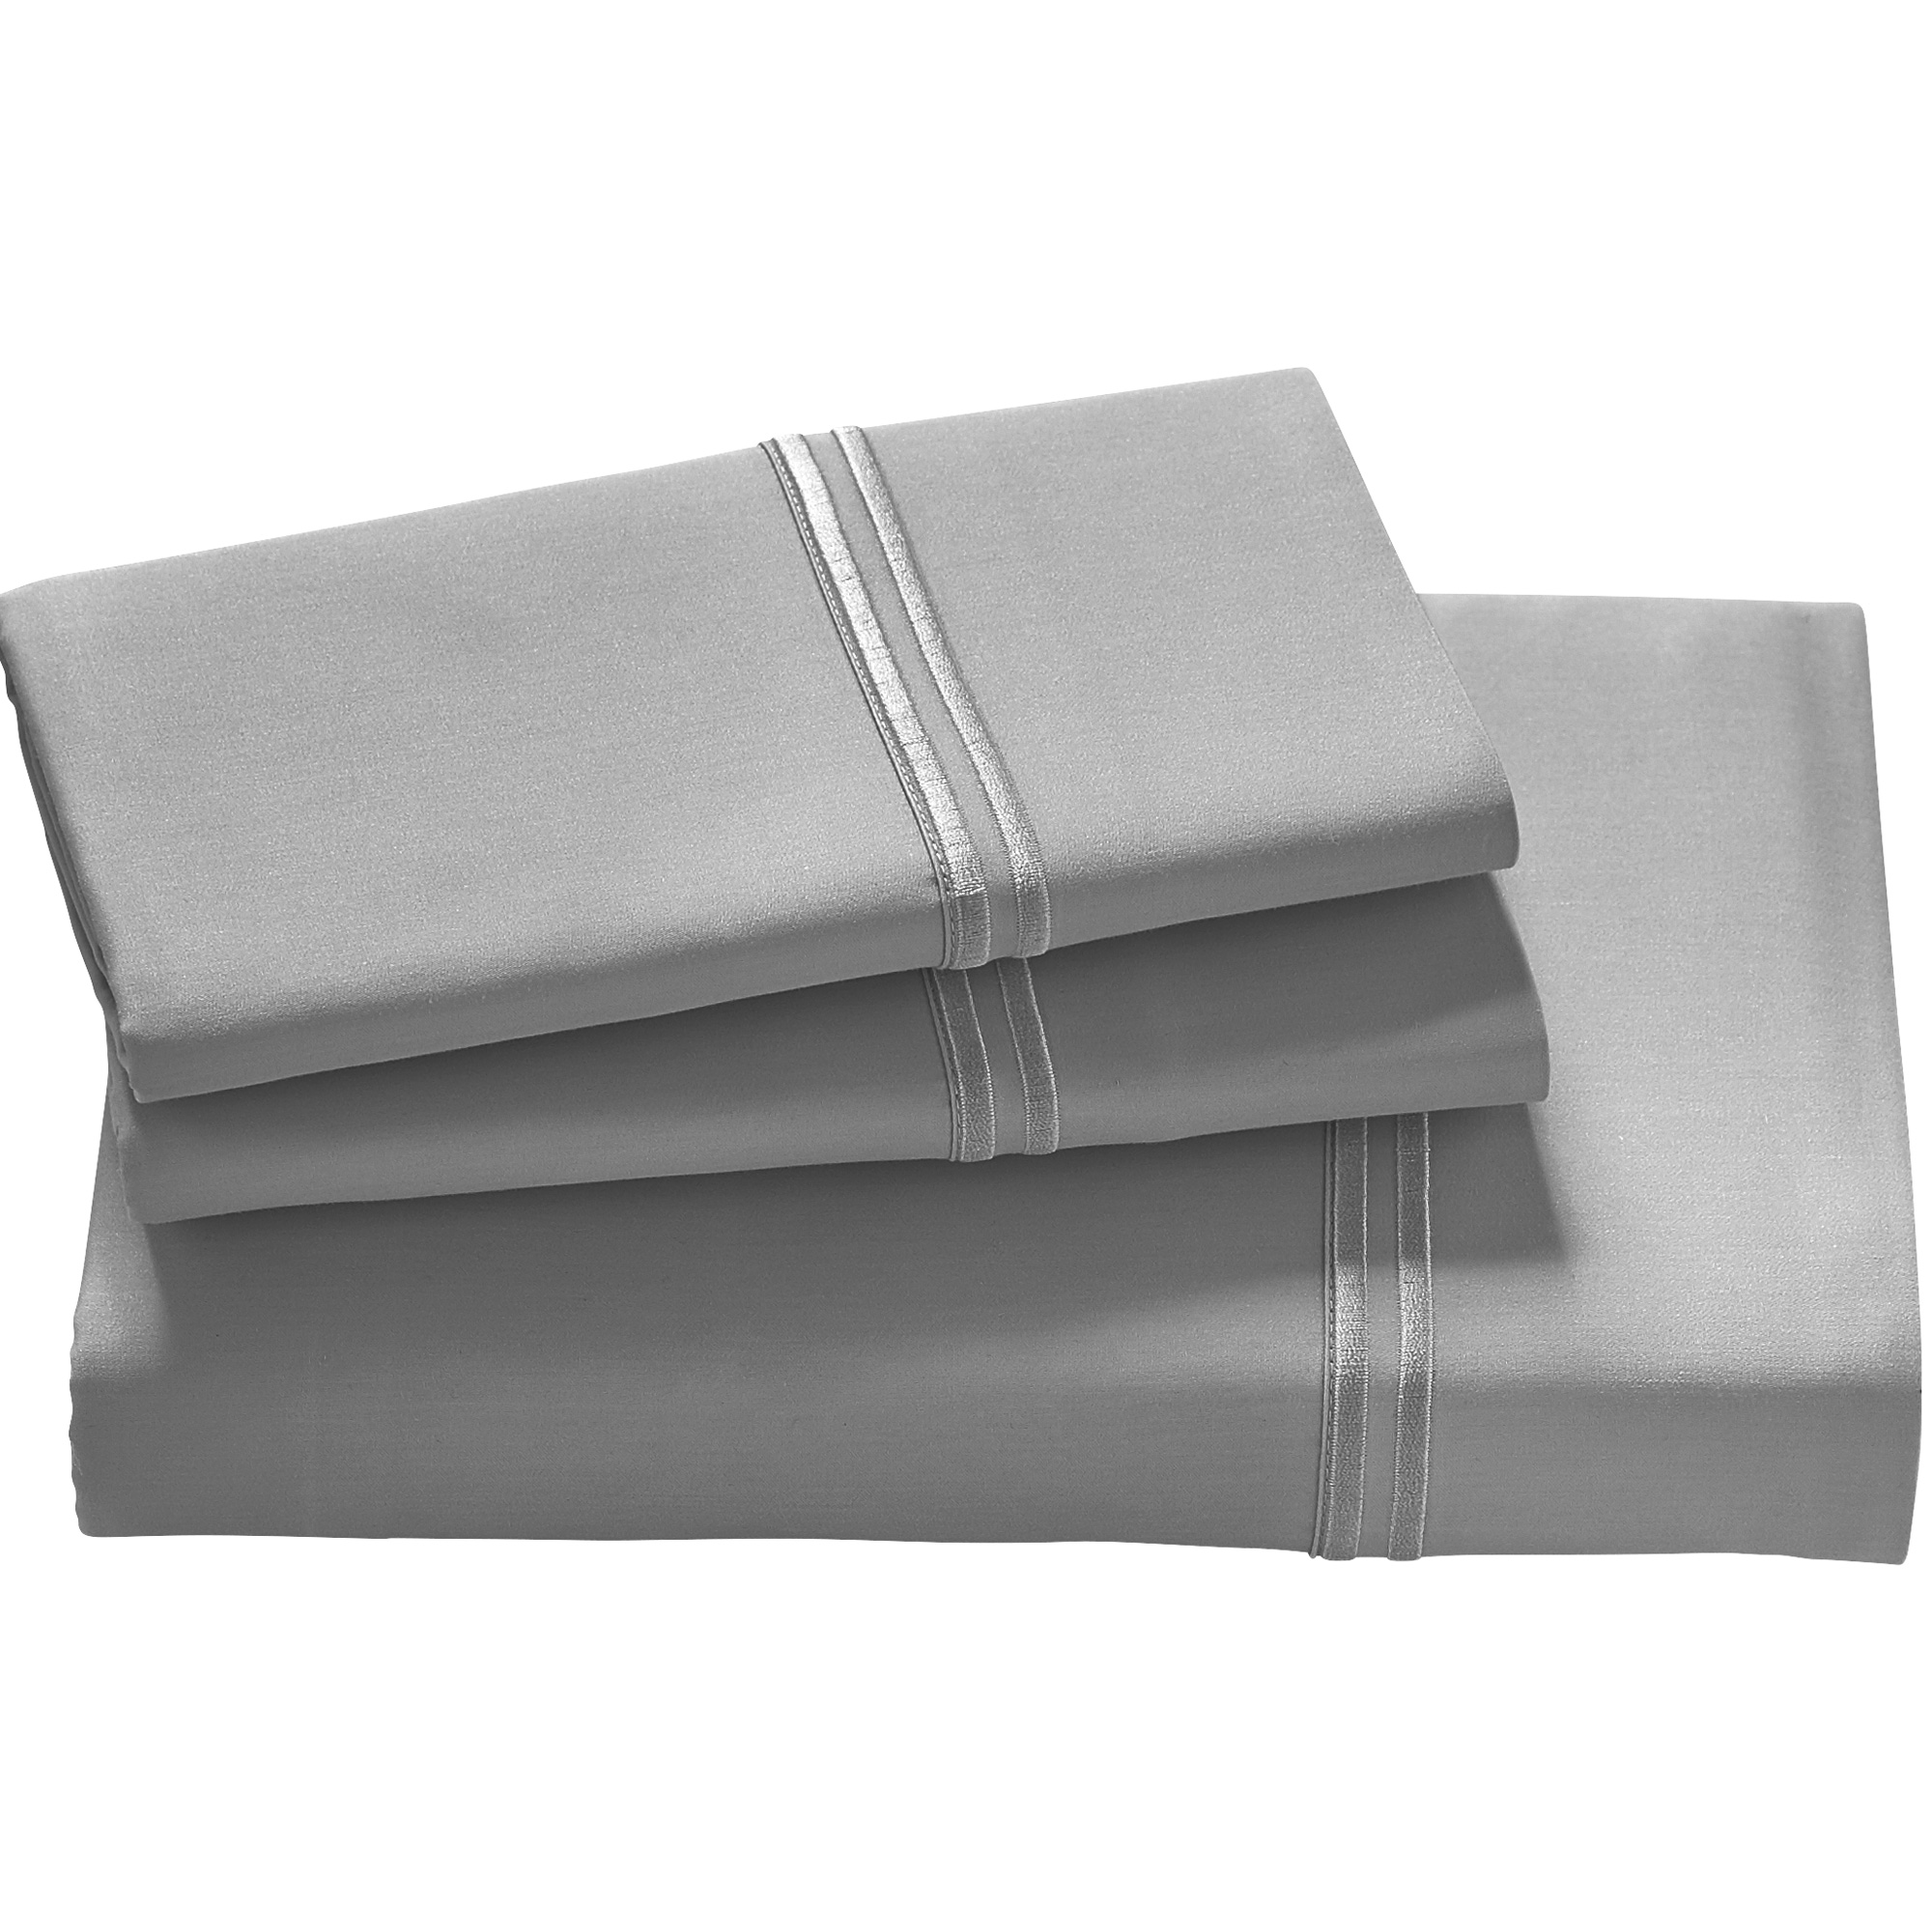 Purecare | Elements Dove Gray Twin Modal Sheet Set